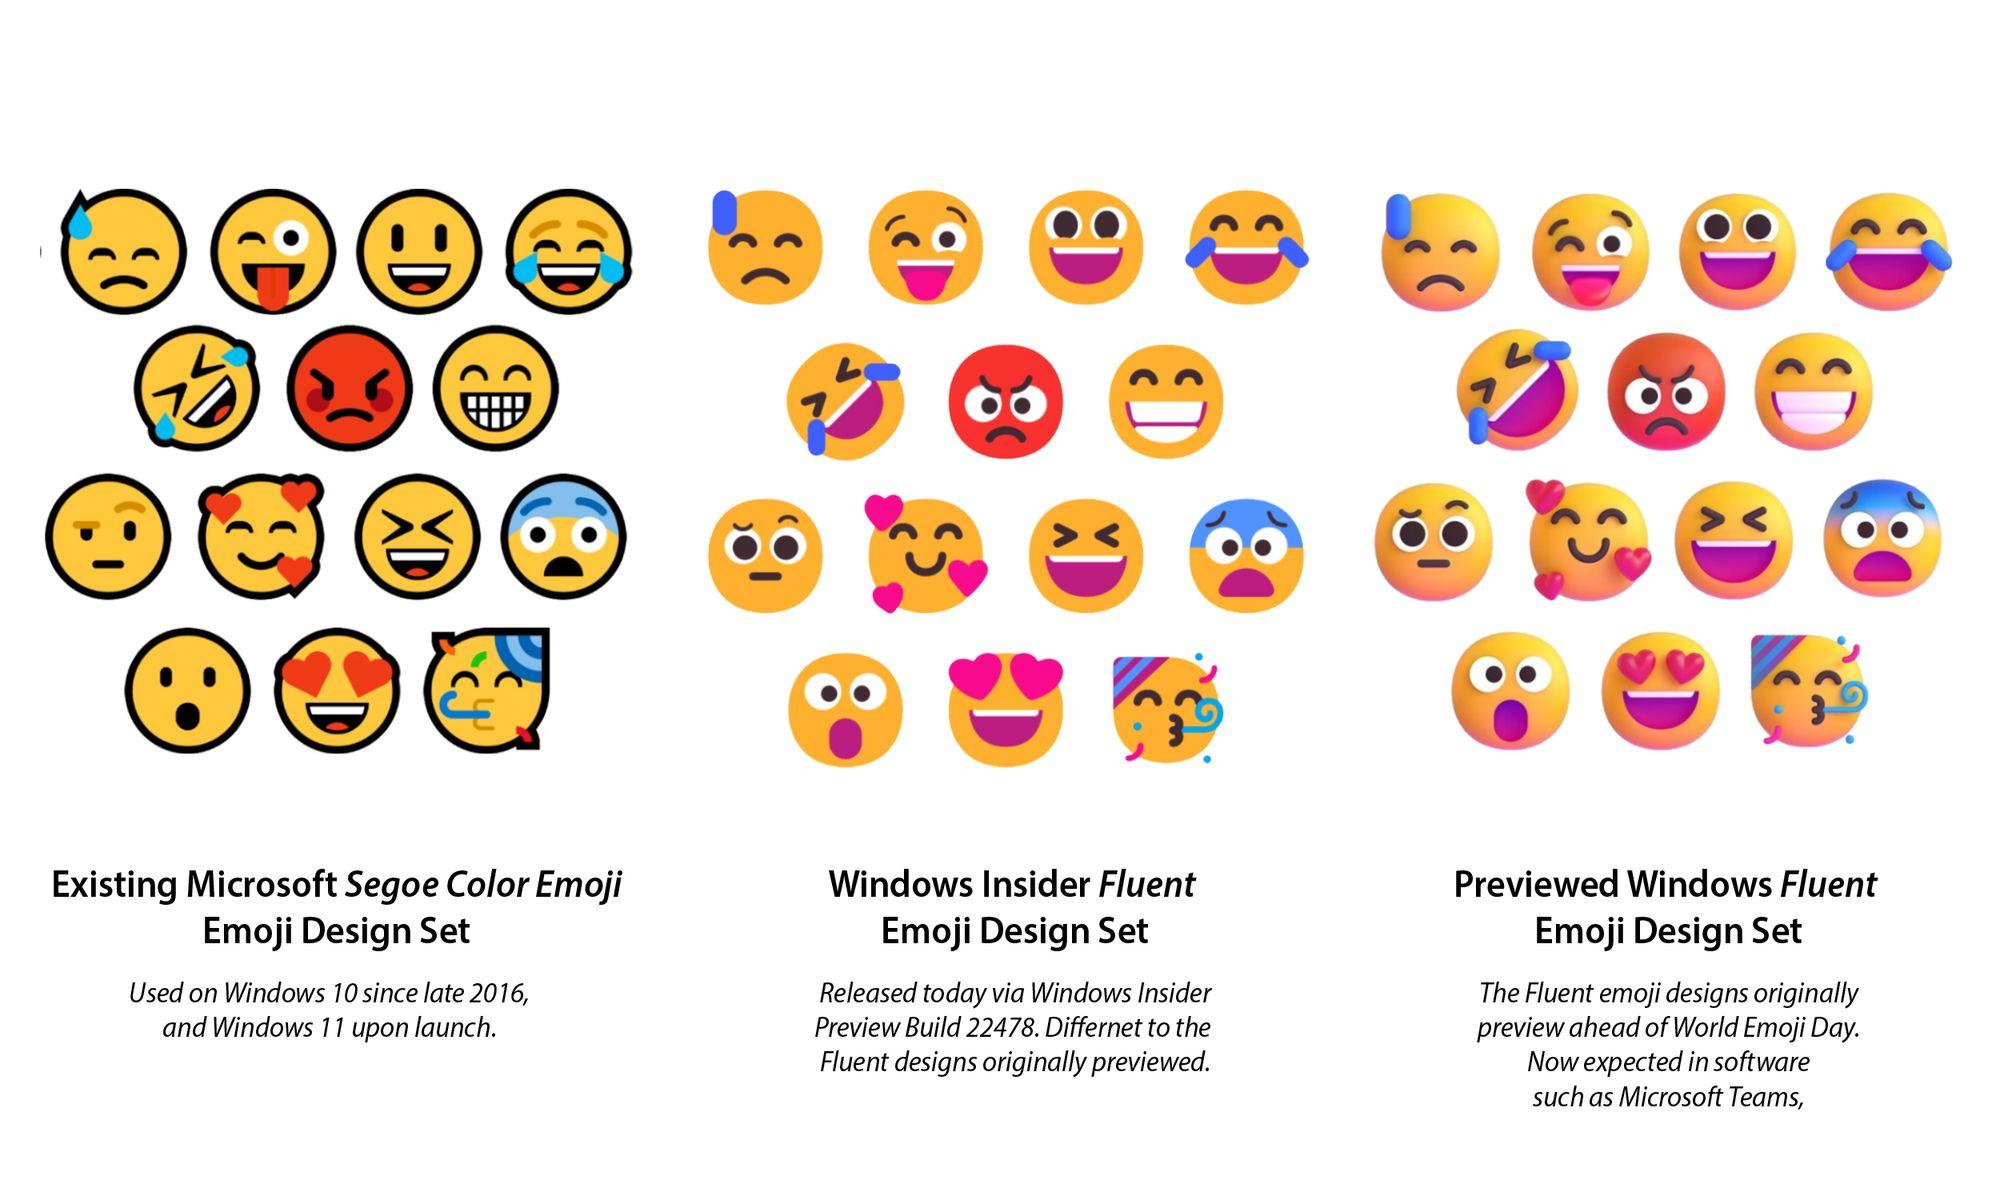 Emojipedia-Windows-11-Fluent-Debut-Comparison